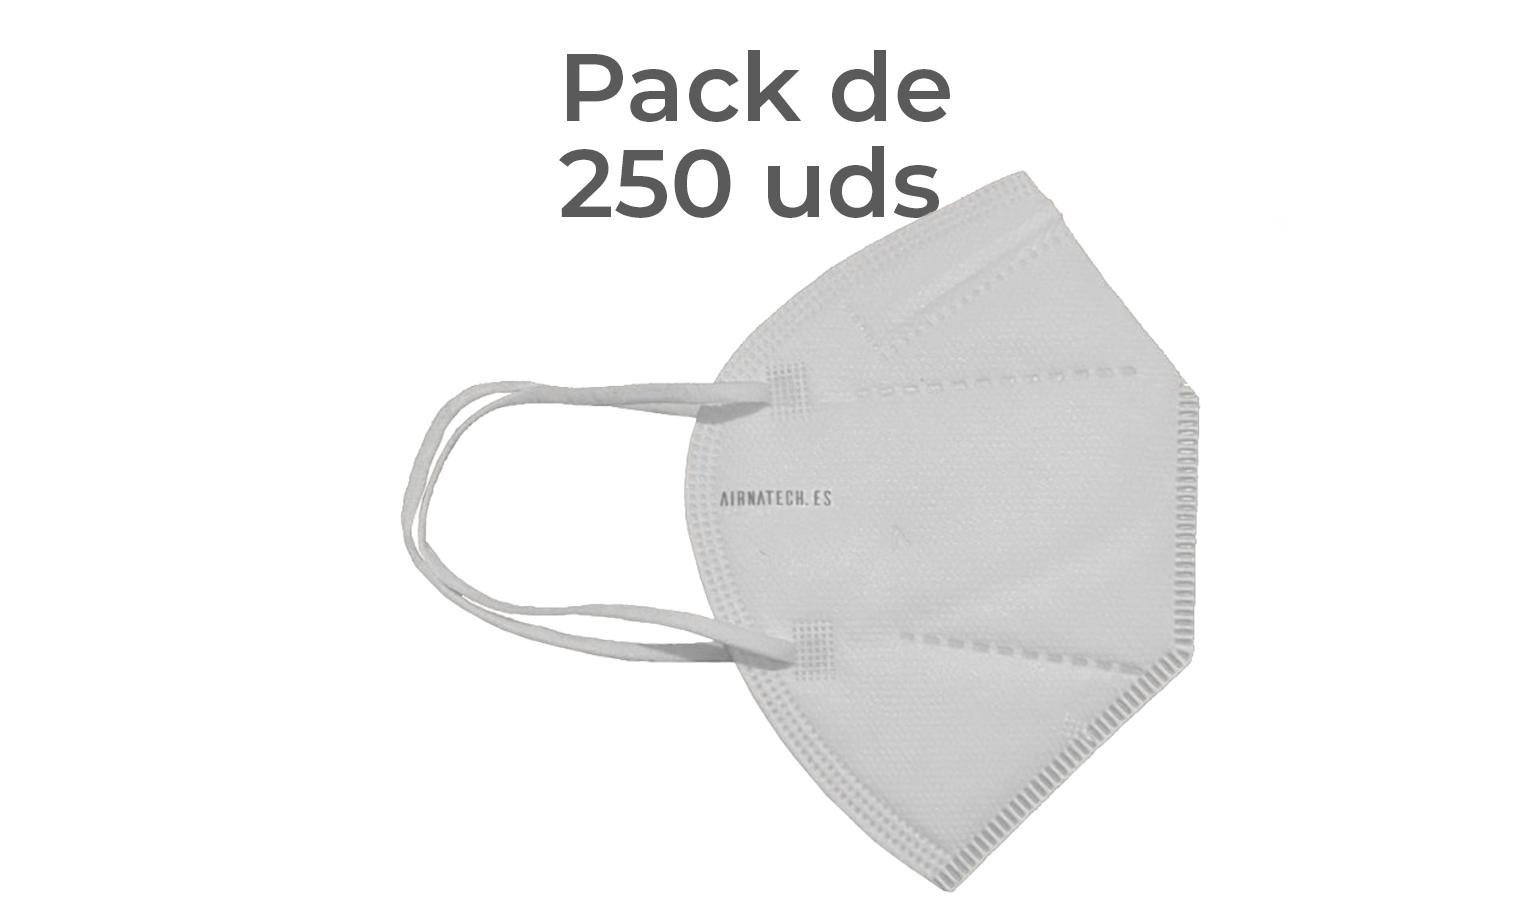 Pack 250 Airnatech Plus 99,90% BLANCA *PORTE GRATIS